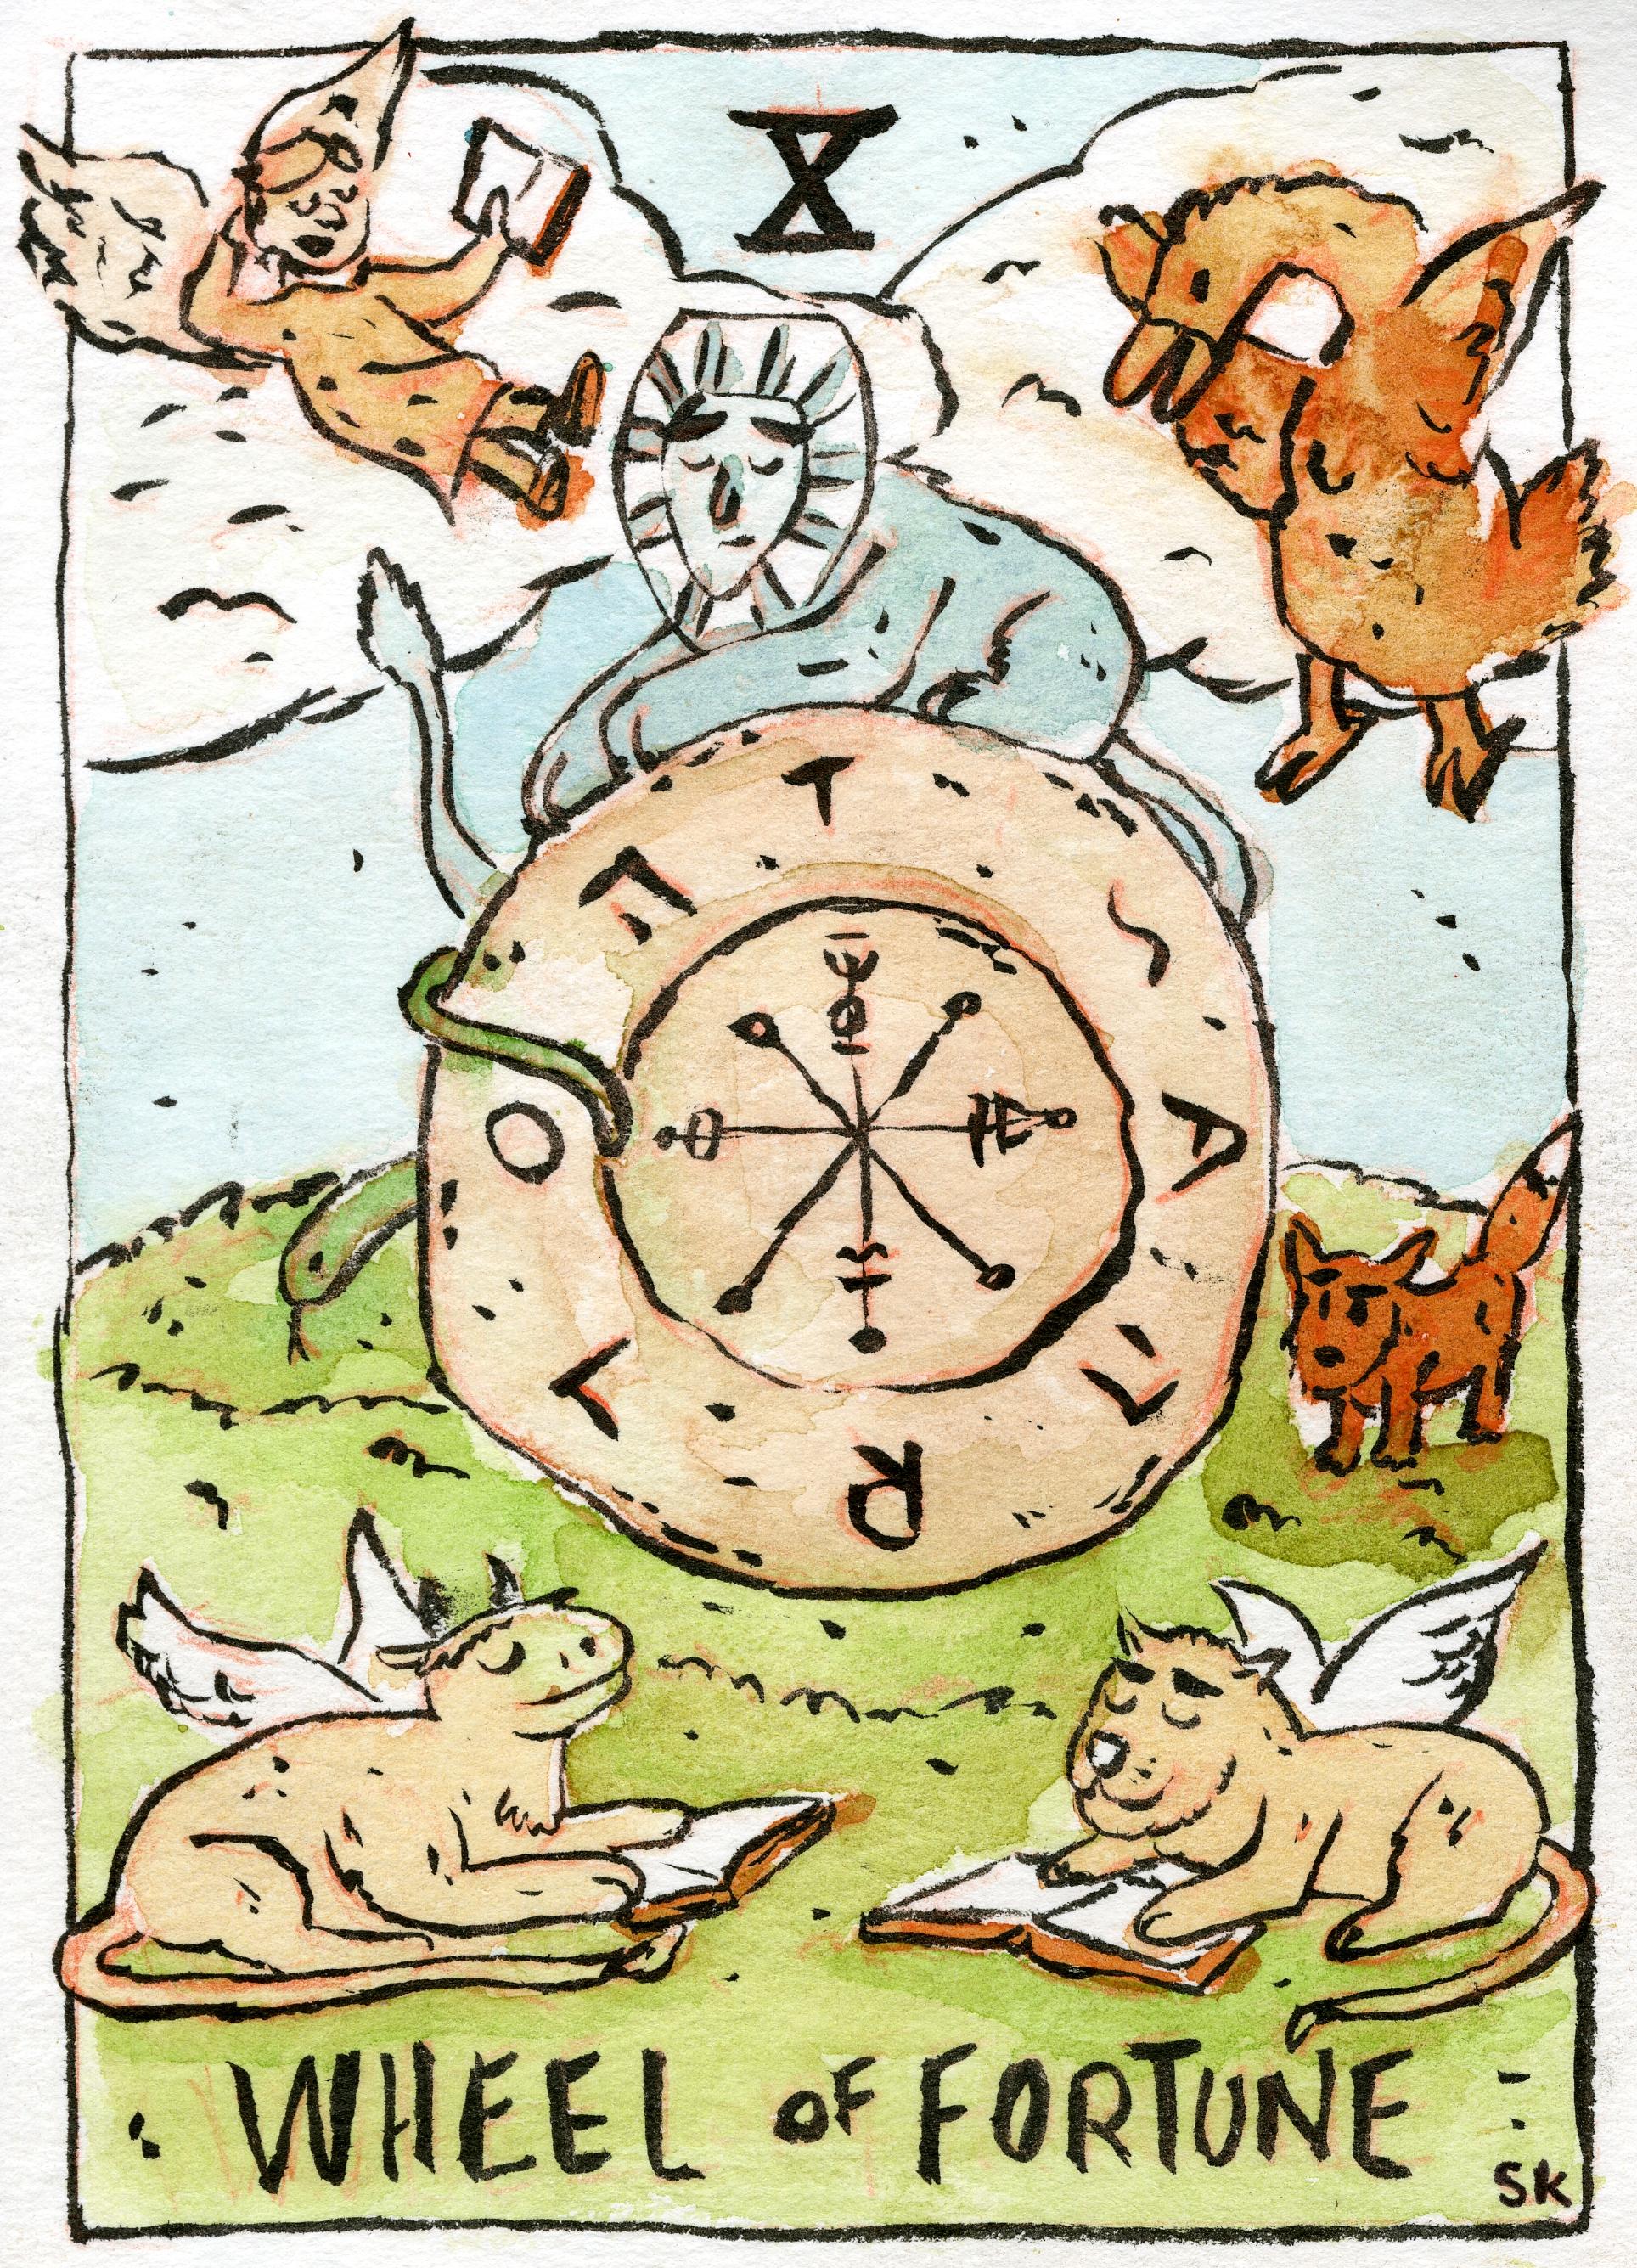 Stephen Kissel - Wheel of Fortune